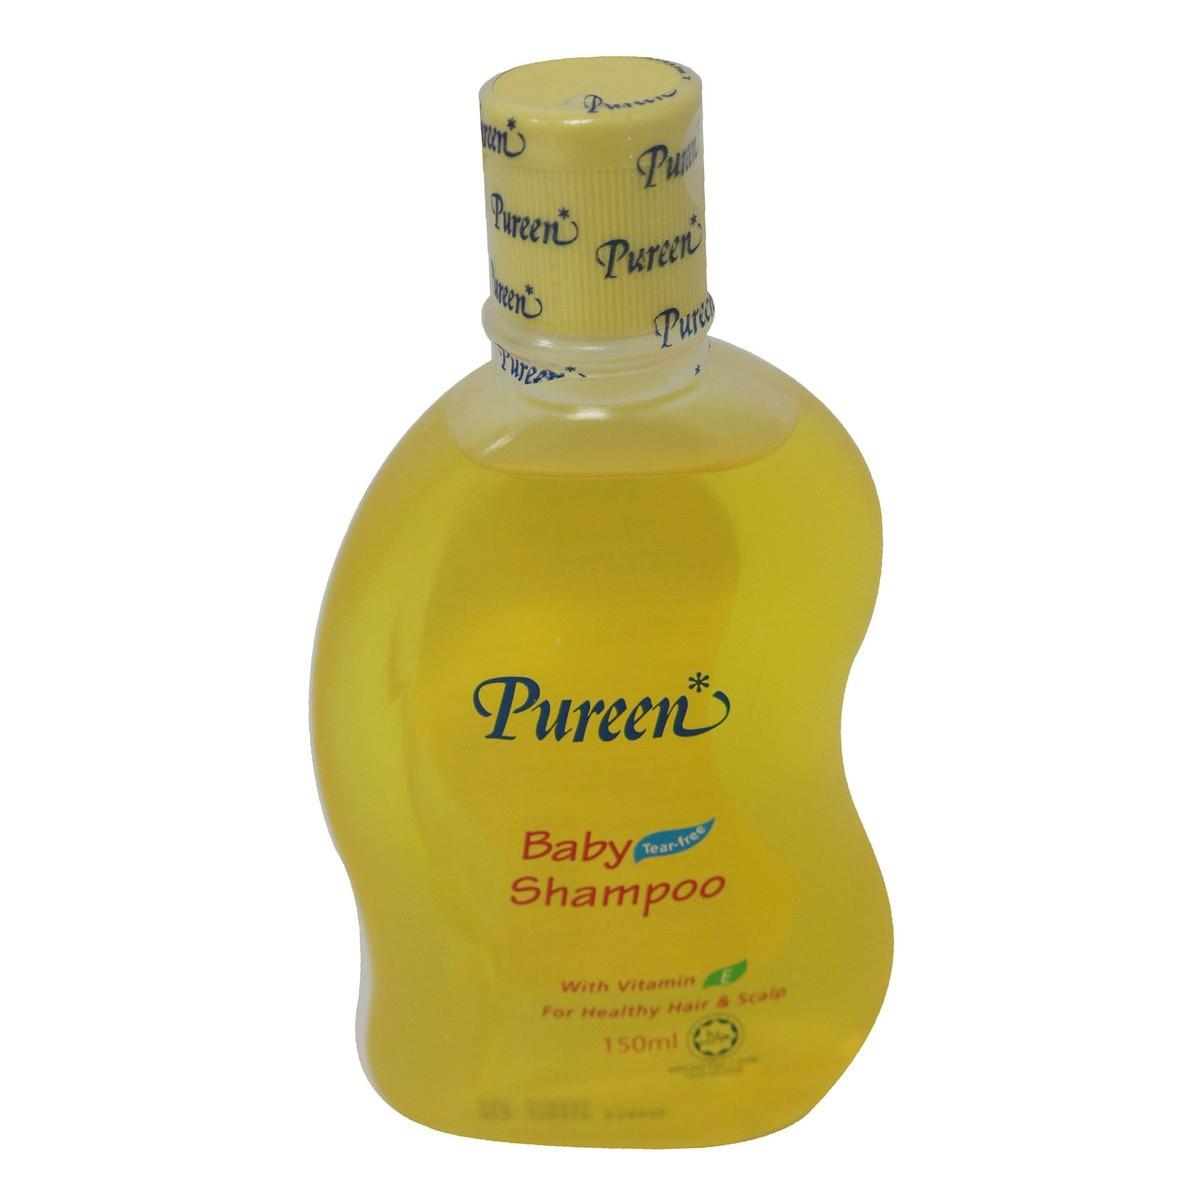 Pureen Baby Shampoo (150ml) - Kico Baby Center